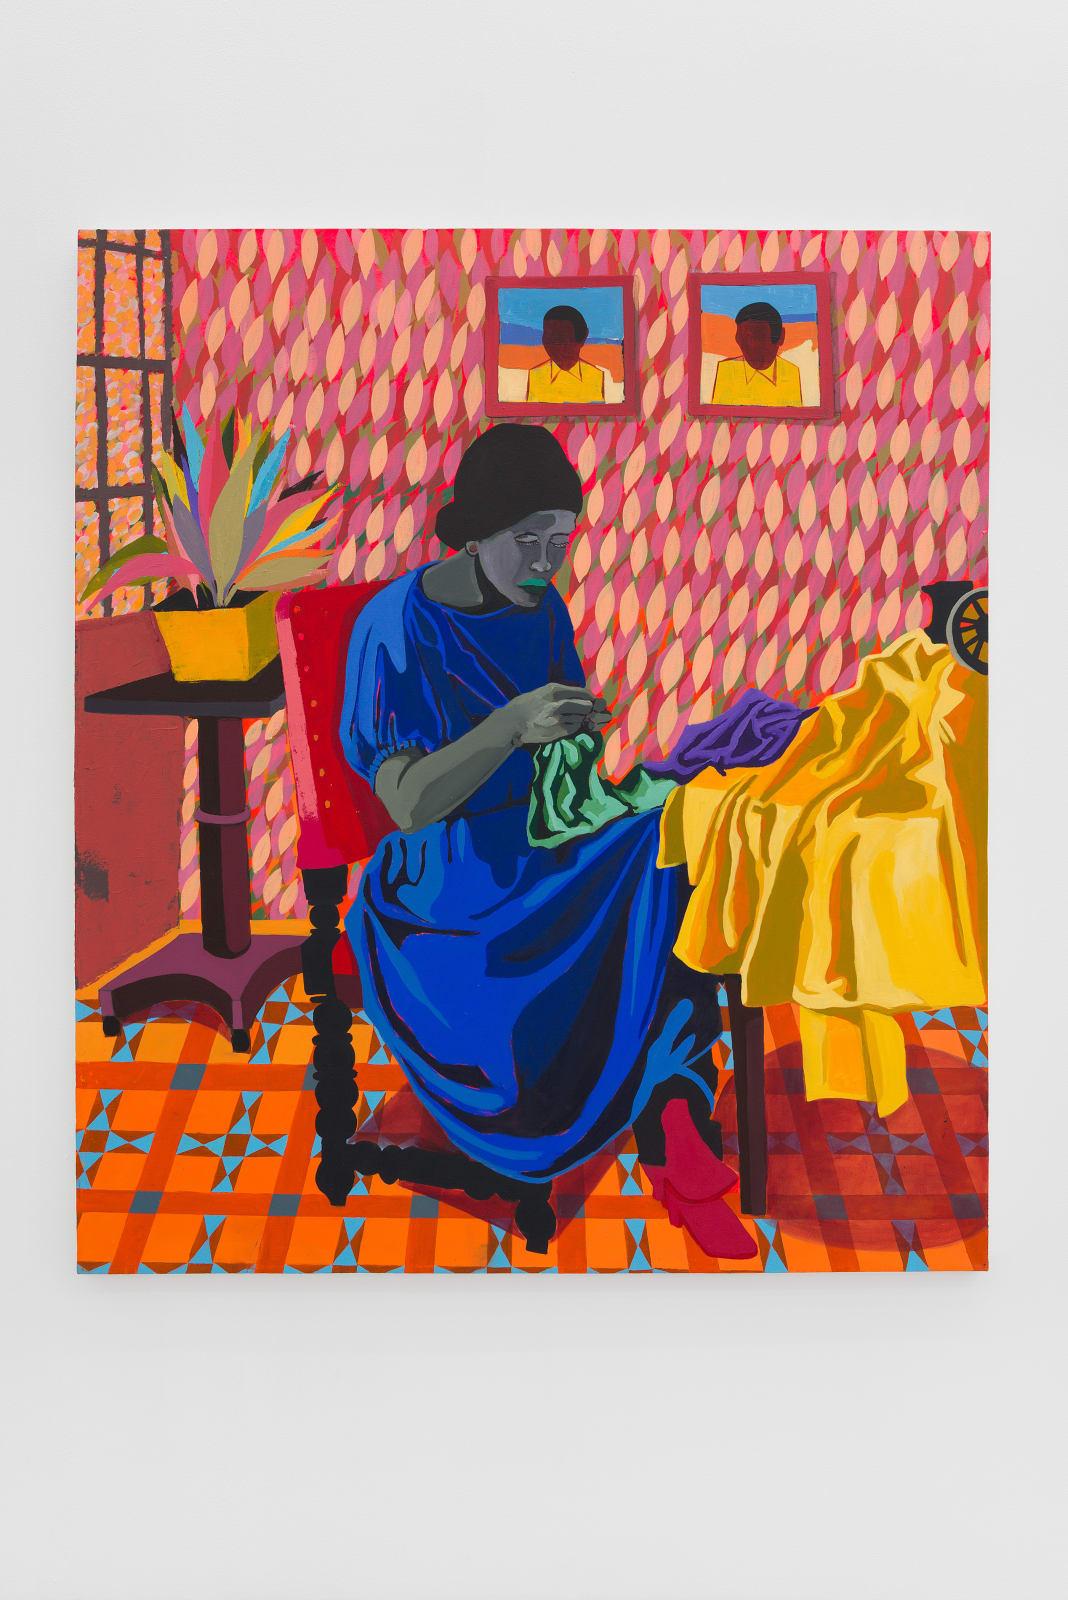 Tafadzwa Tega, Untitled, 2019